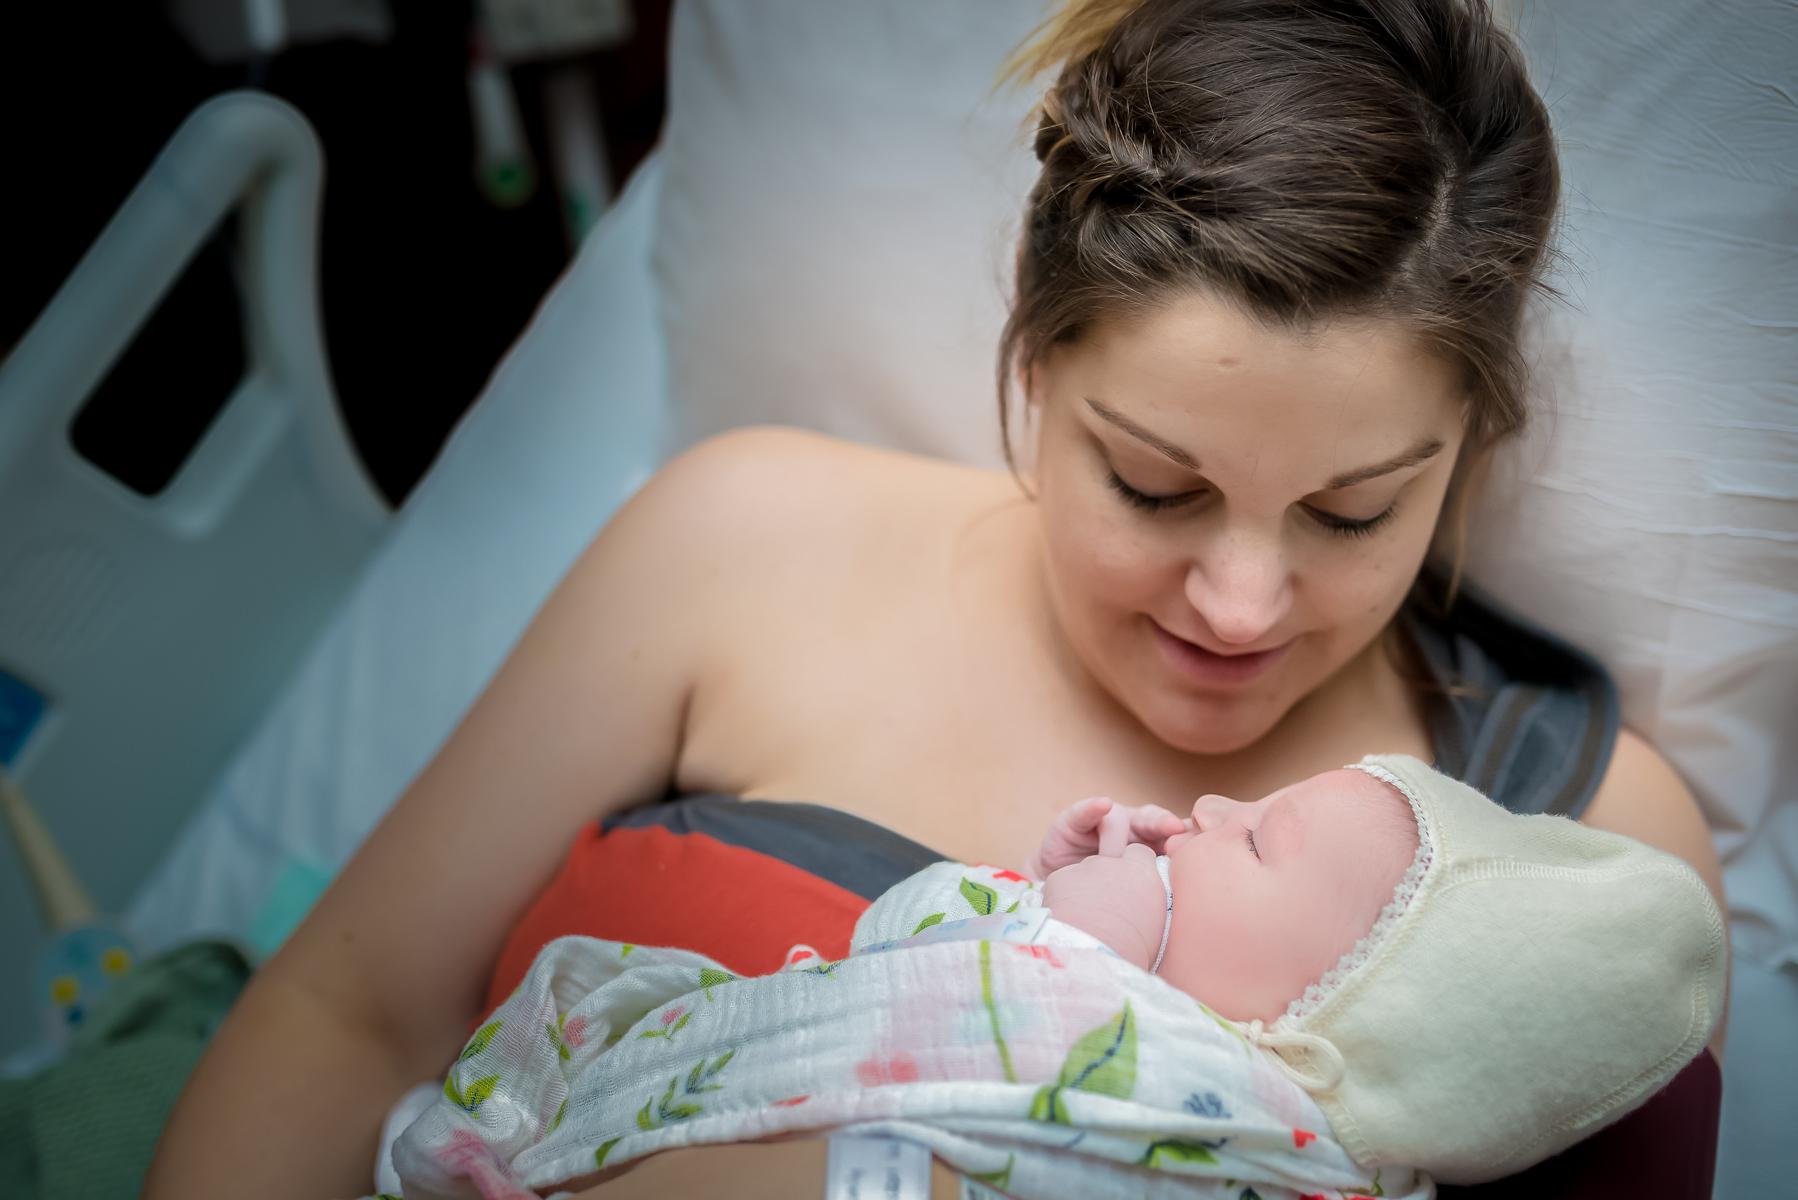 denver-cesarean-birth-photography